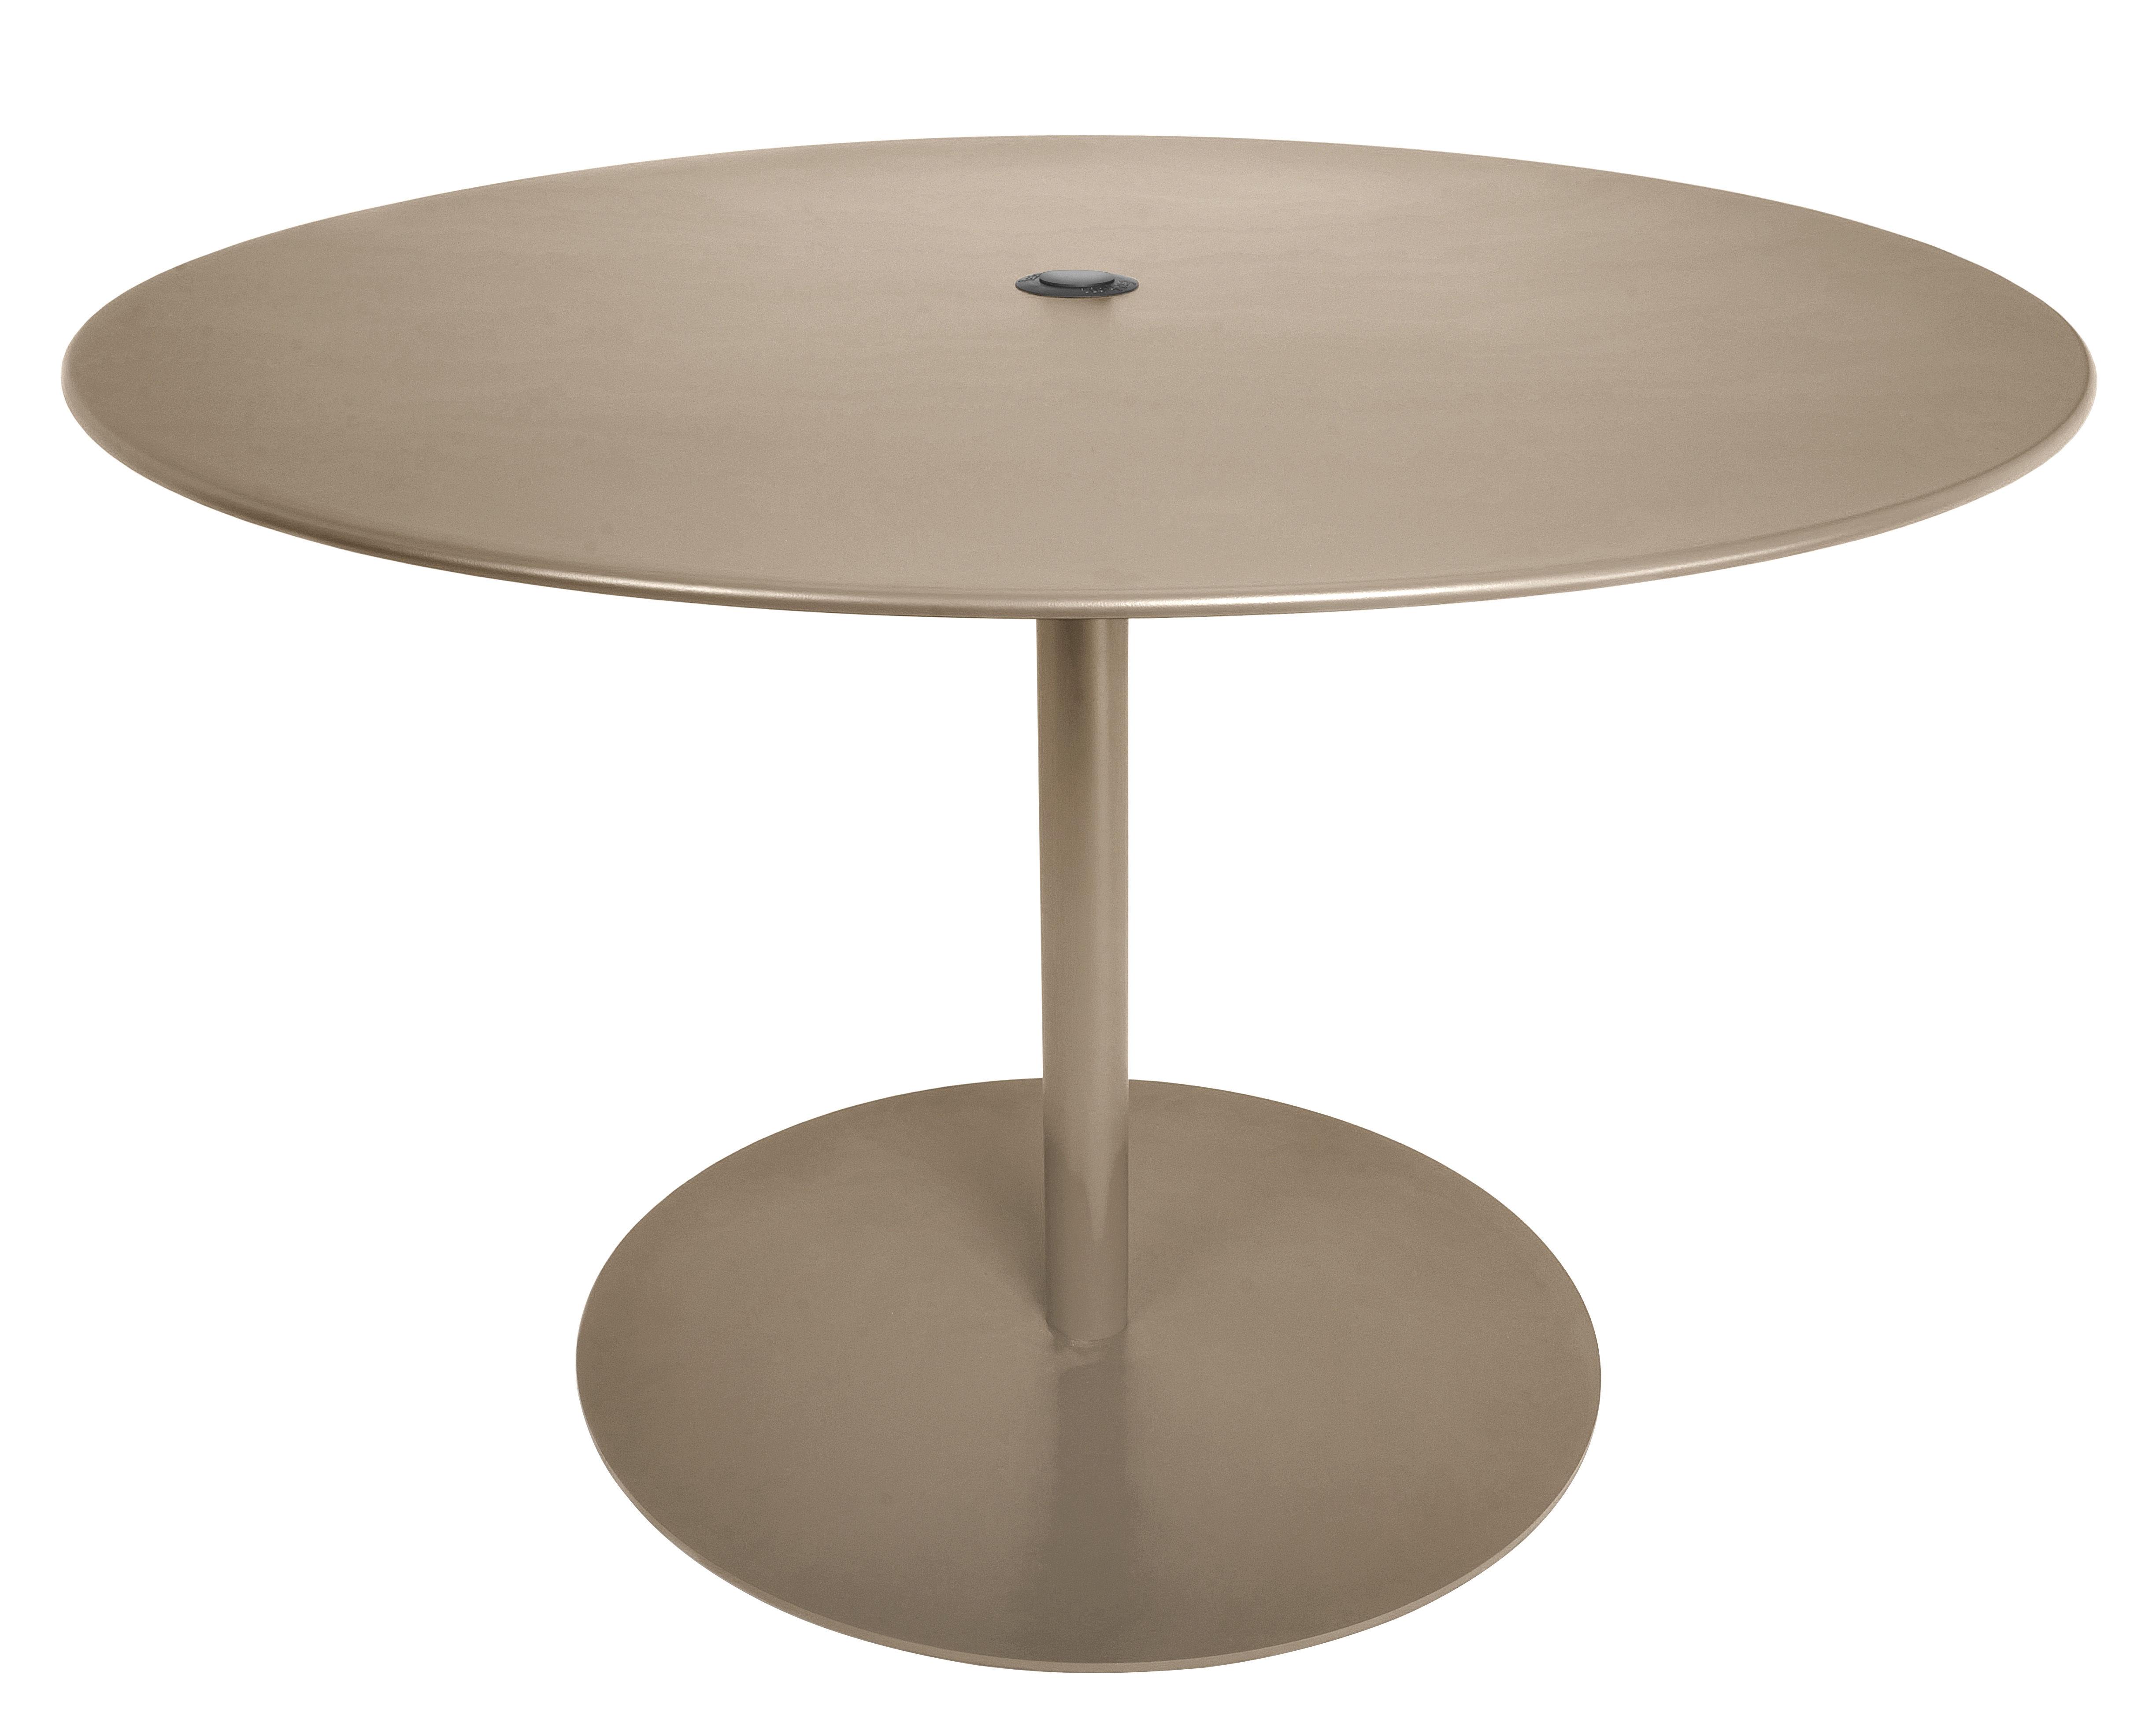 Outdoor - Tables de jardin - Table ronde FormiTable XL / Métal - Ø 120 cm - Fatboy - Taupe - Métal galvanisé